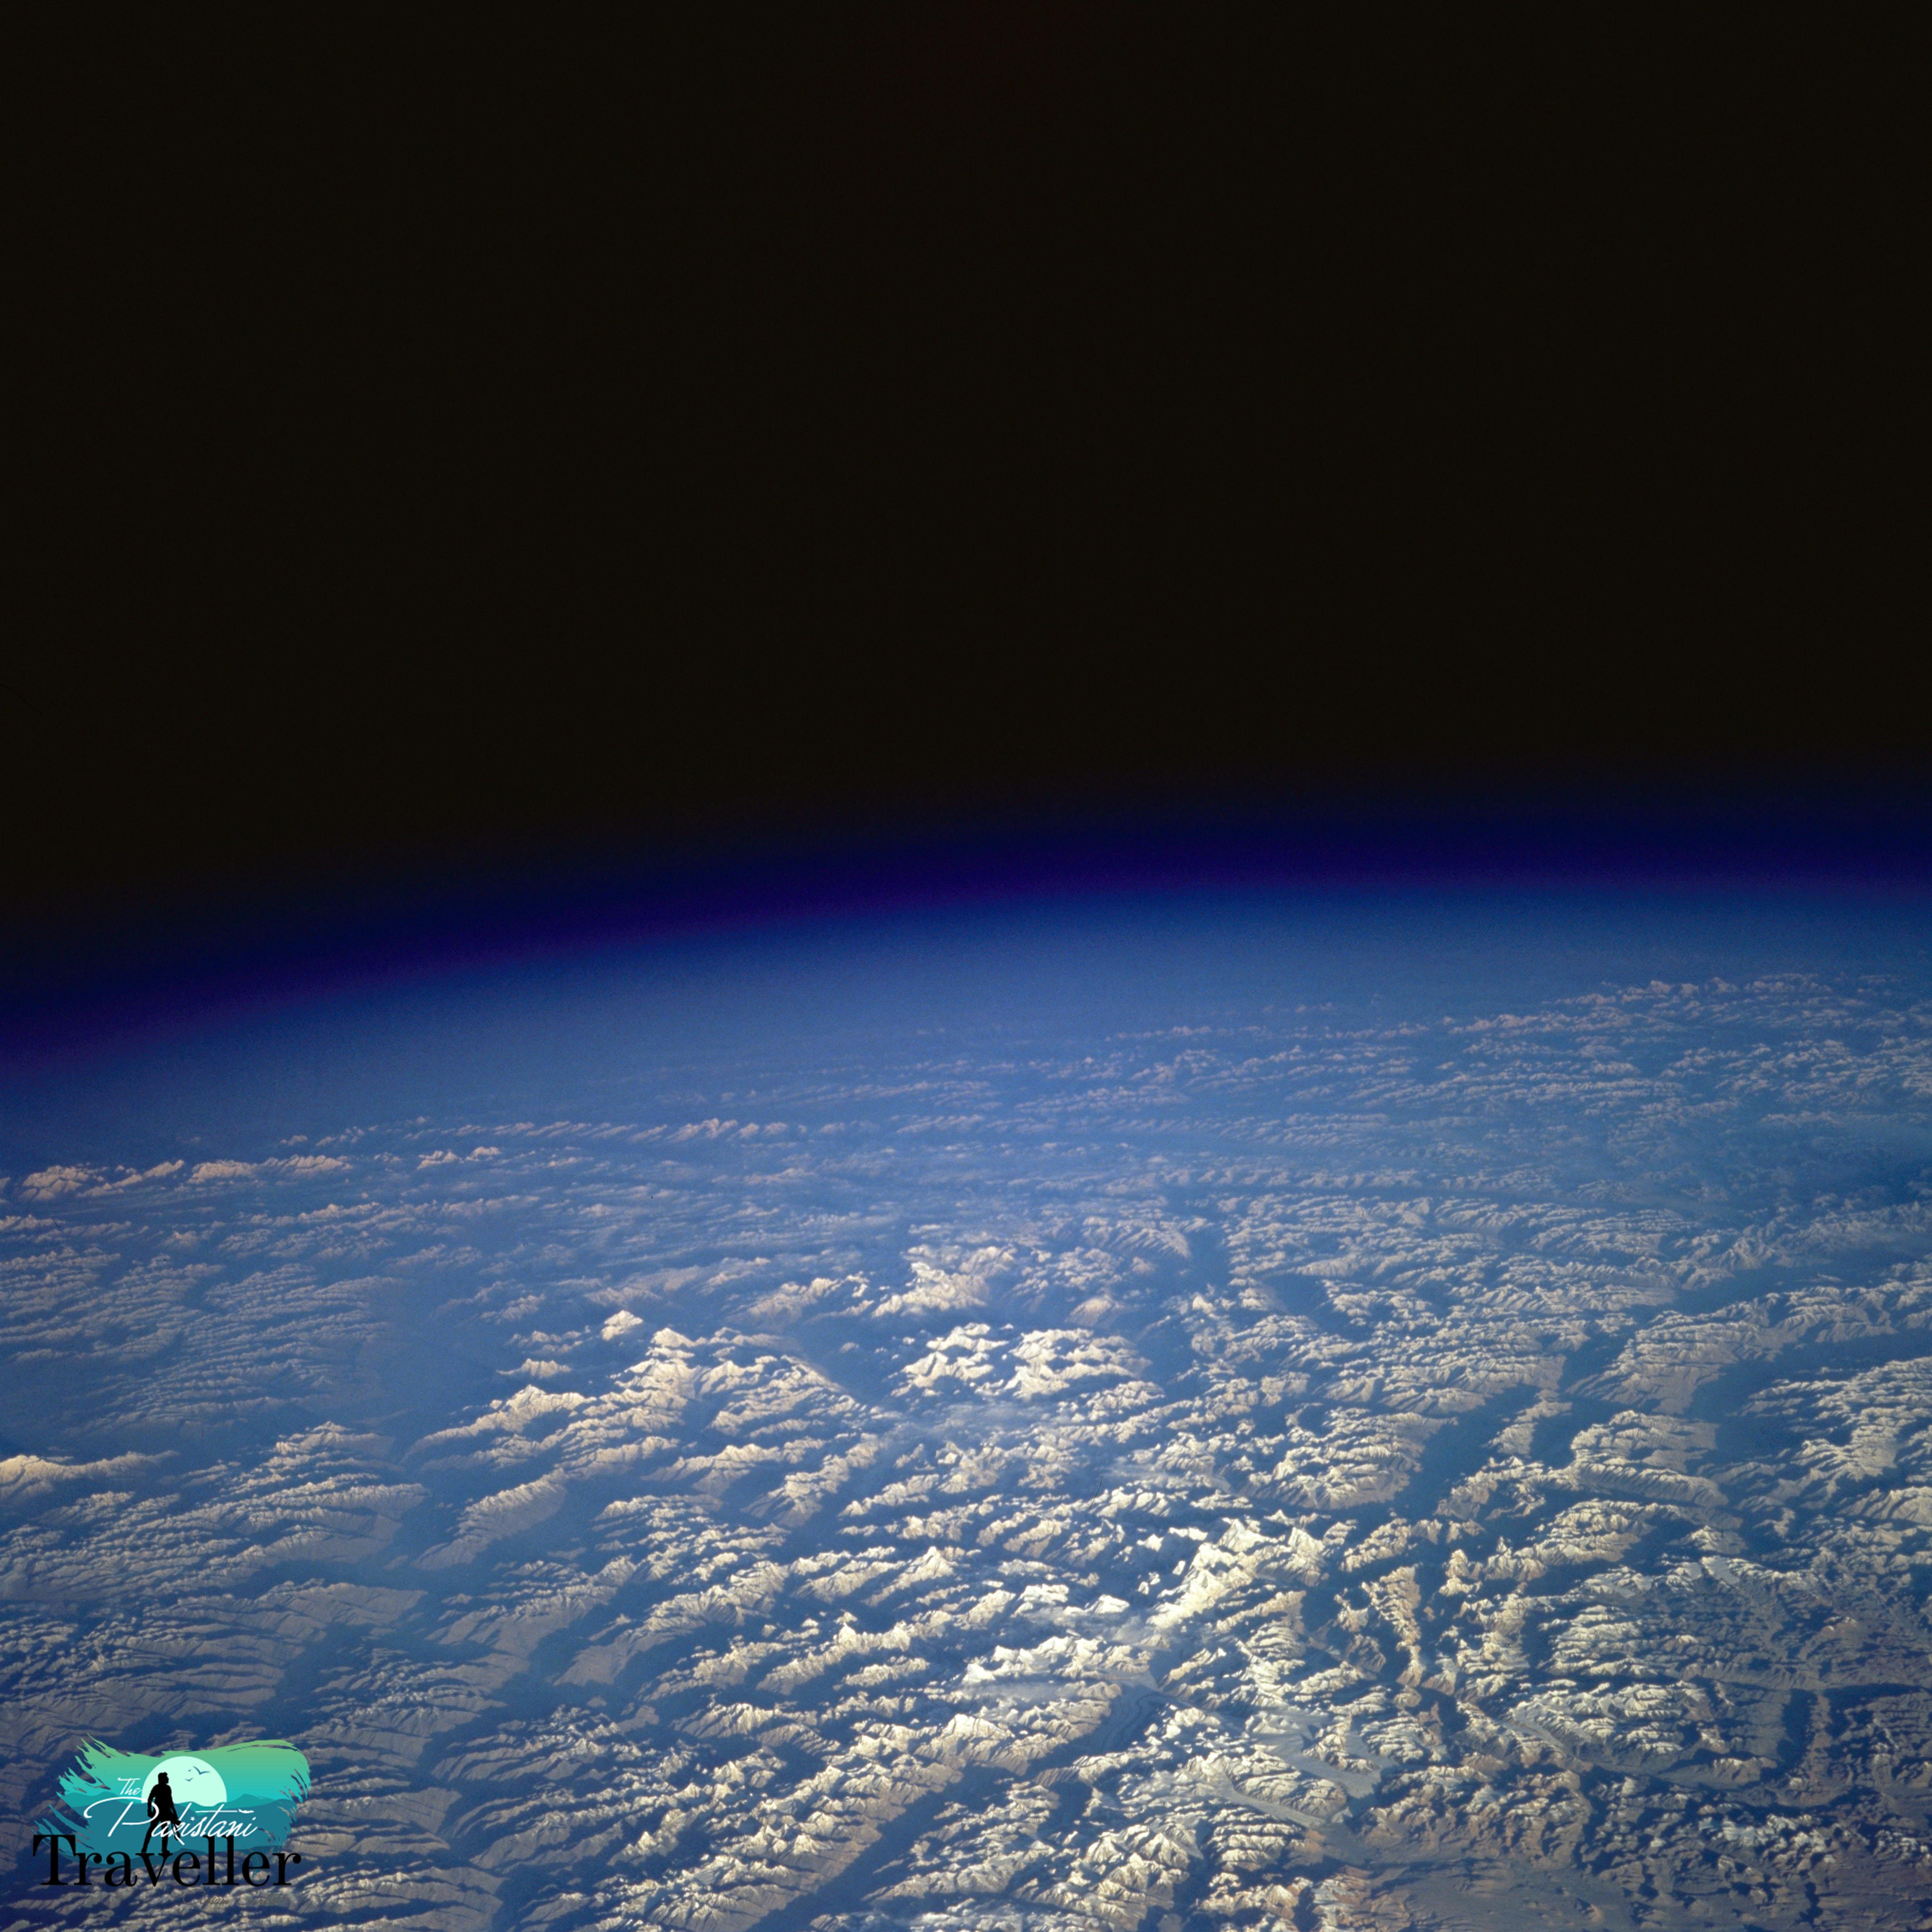 13. Karakorum Range, Pakistan as seen from STS-58